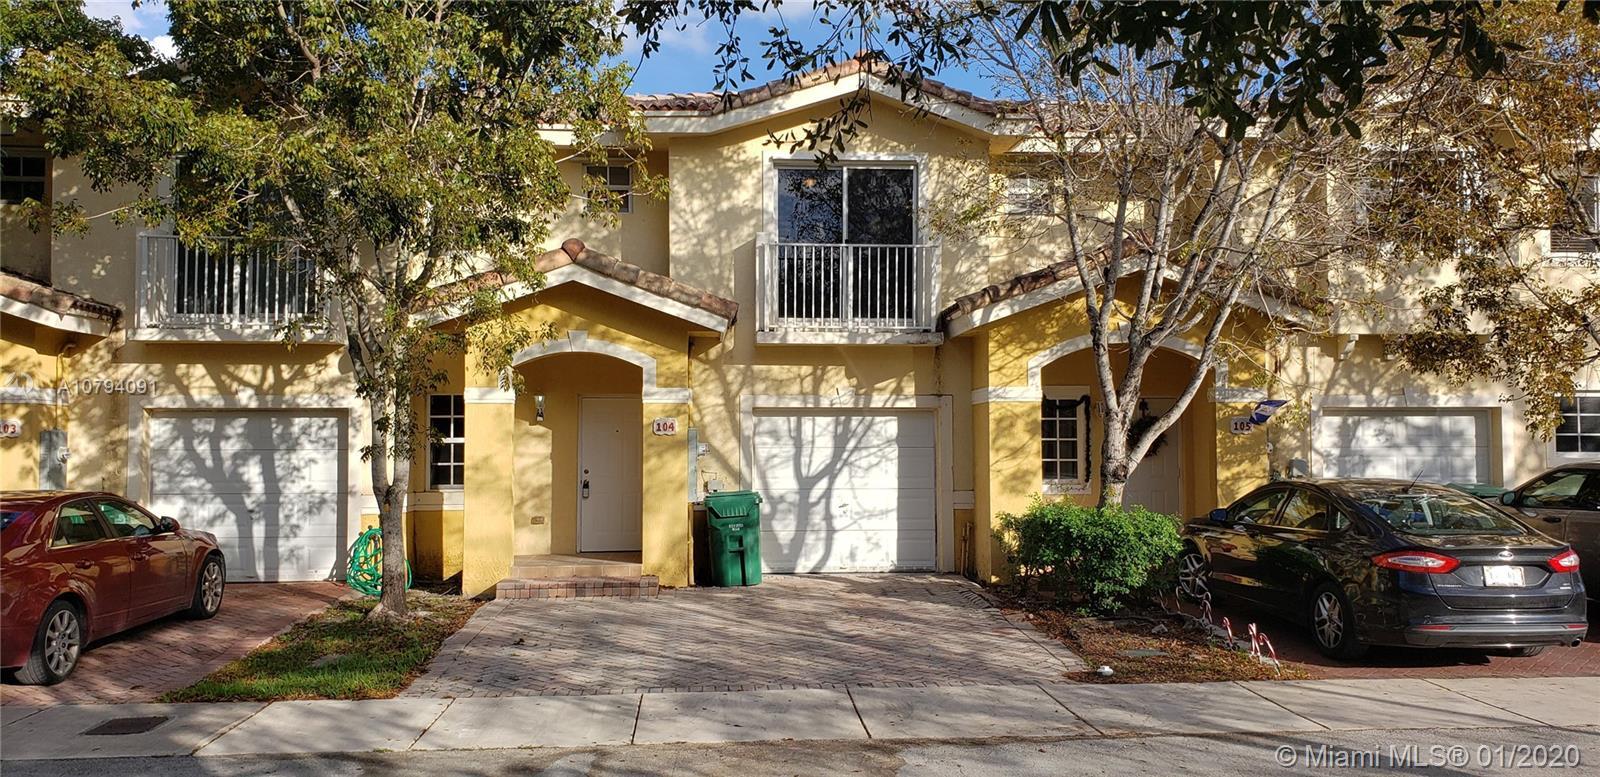 14116 SW 260th St #104, Homestead, FL 33032 - Homestead, FL real estate listing